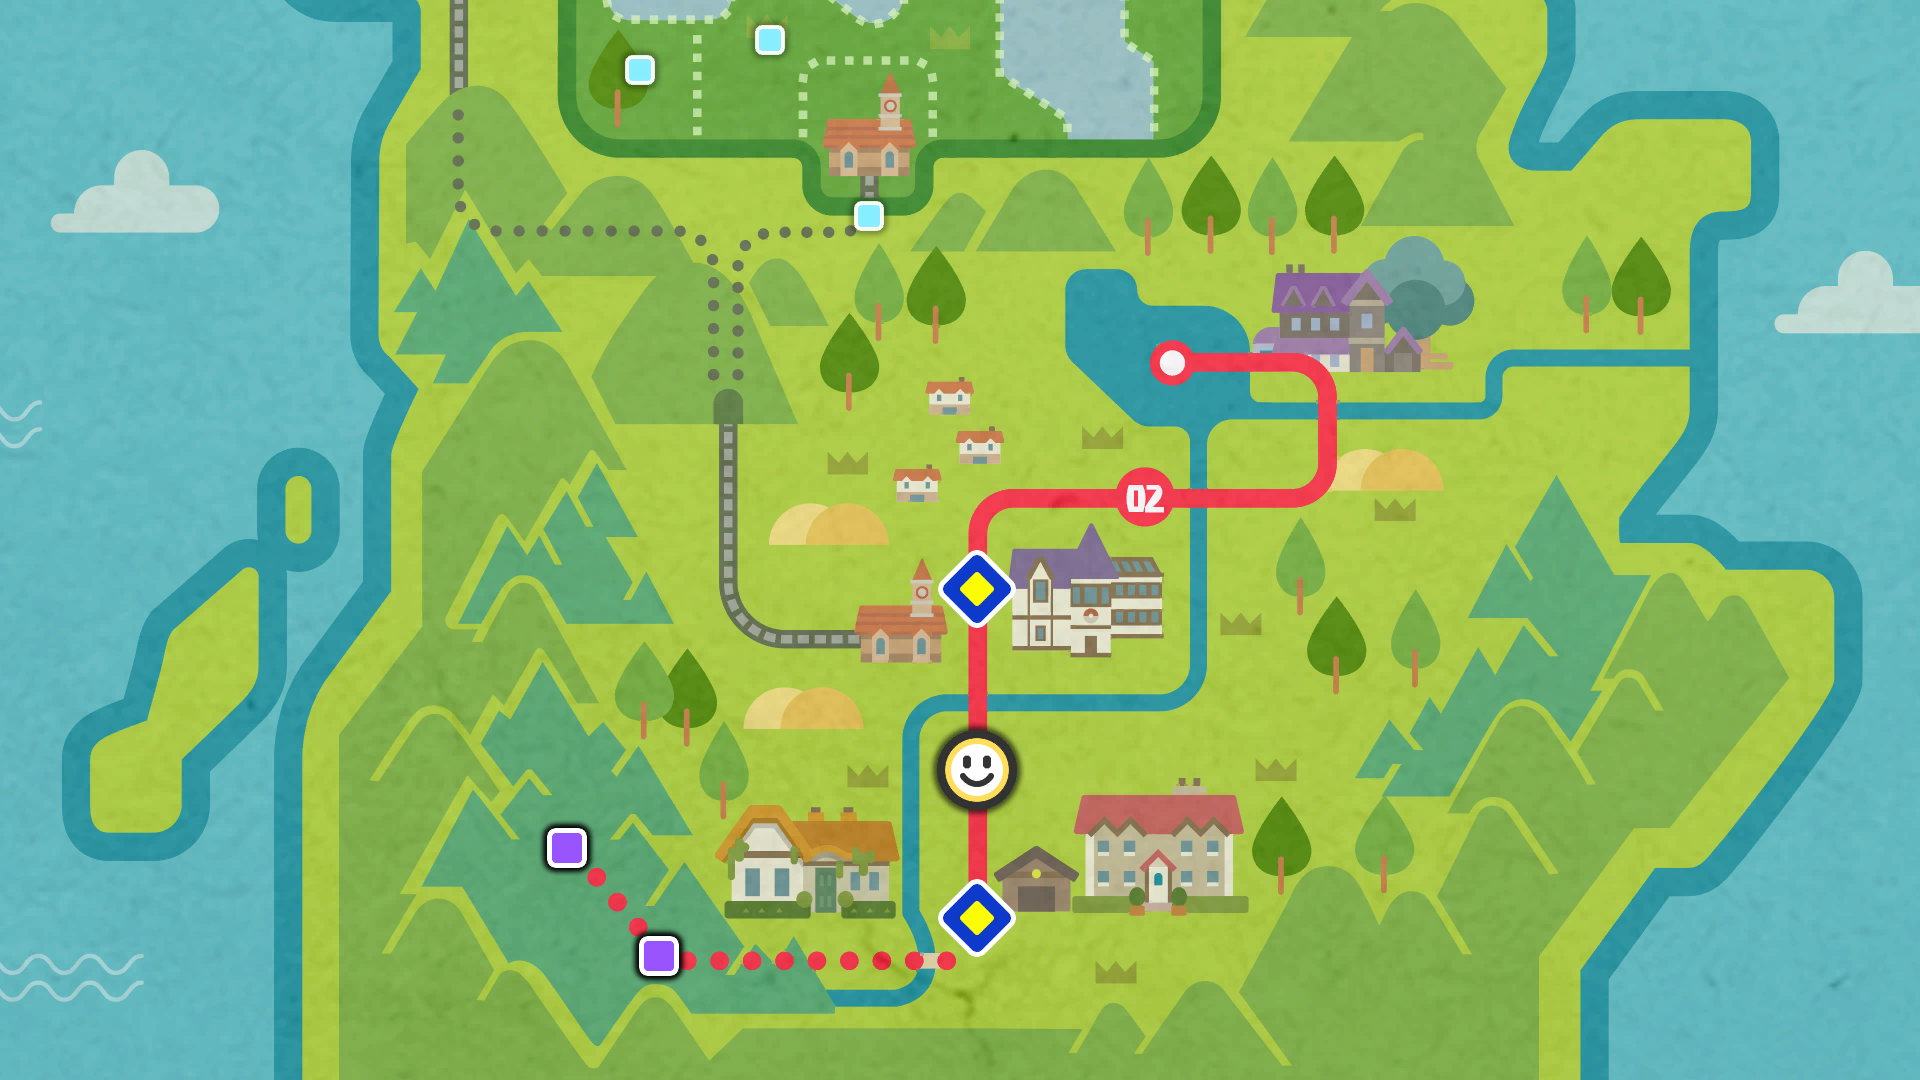 Percorso 1 Galar SpSc mappa.png